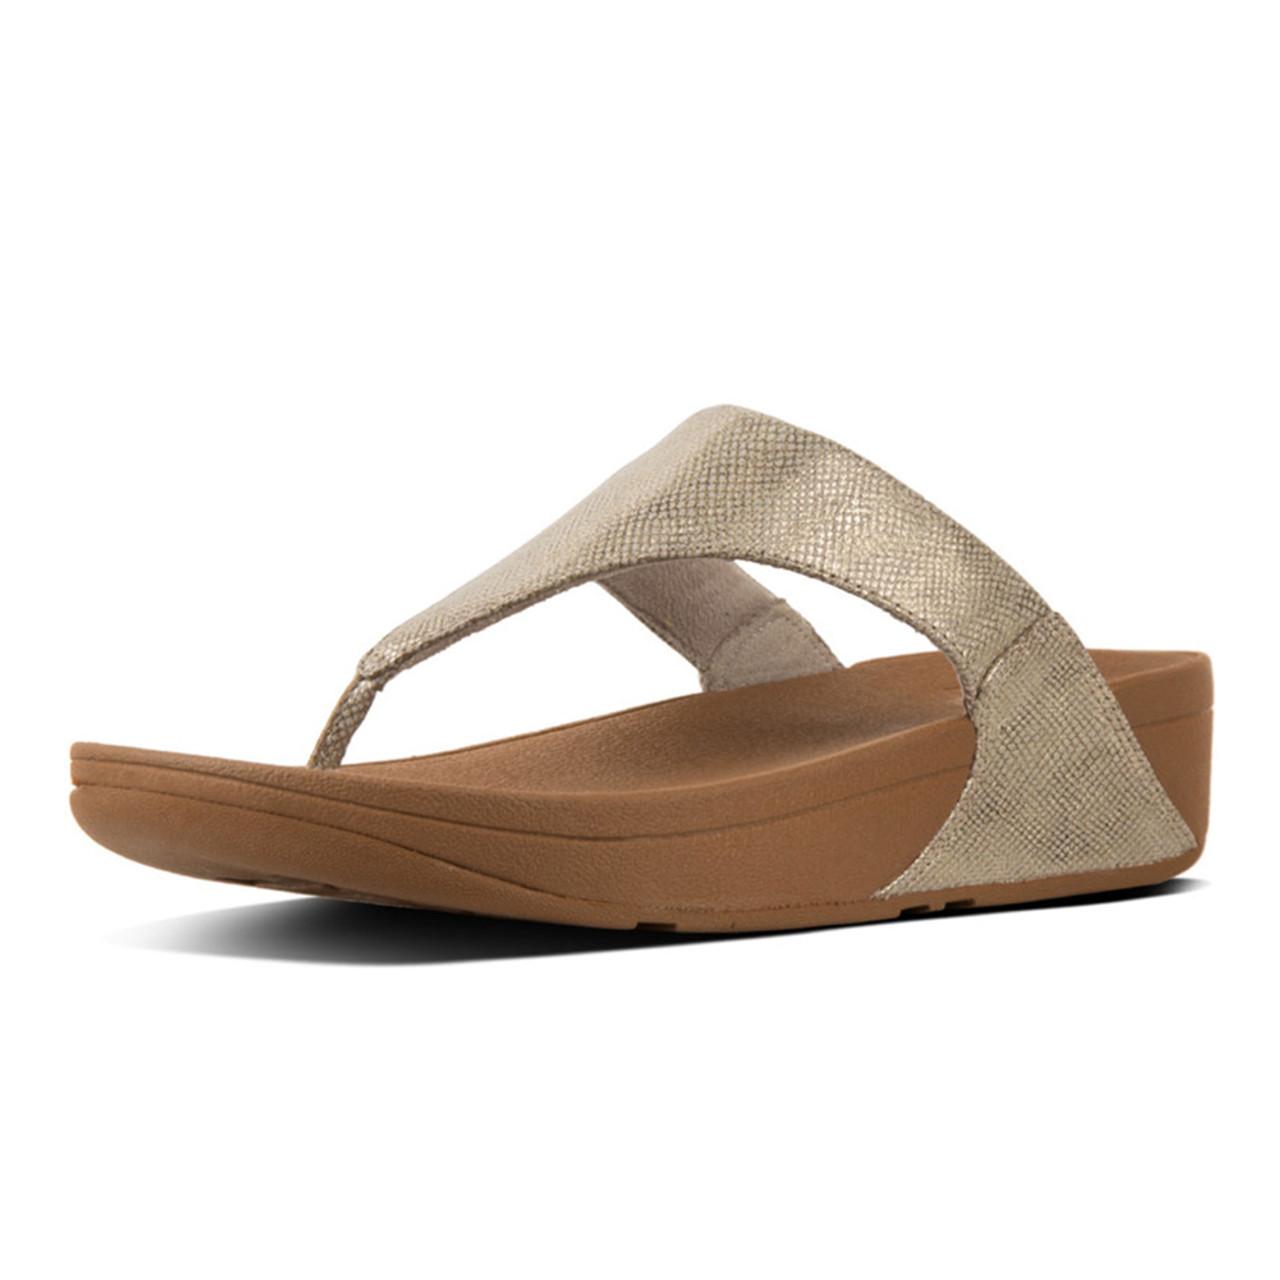 0440a06970c8f6 Fitflop Women s Lulu Thong Sandal Gold Shimmer Print - Shop now   Shoolu.com